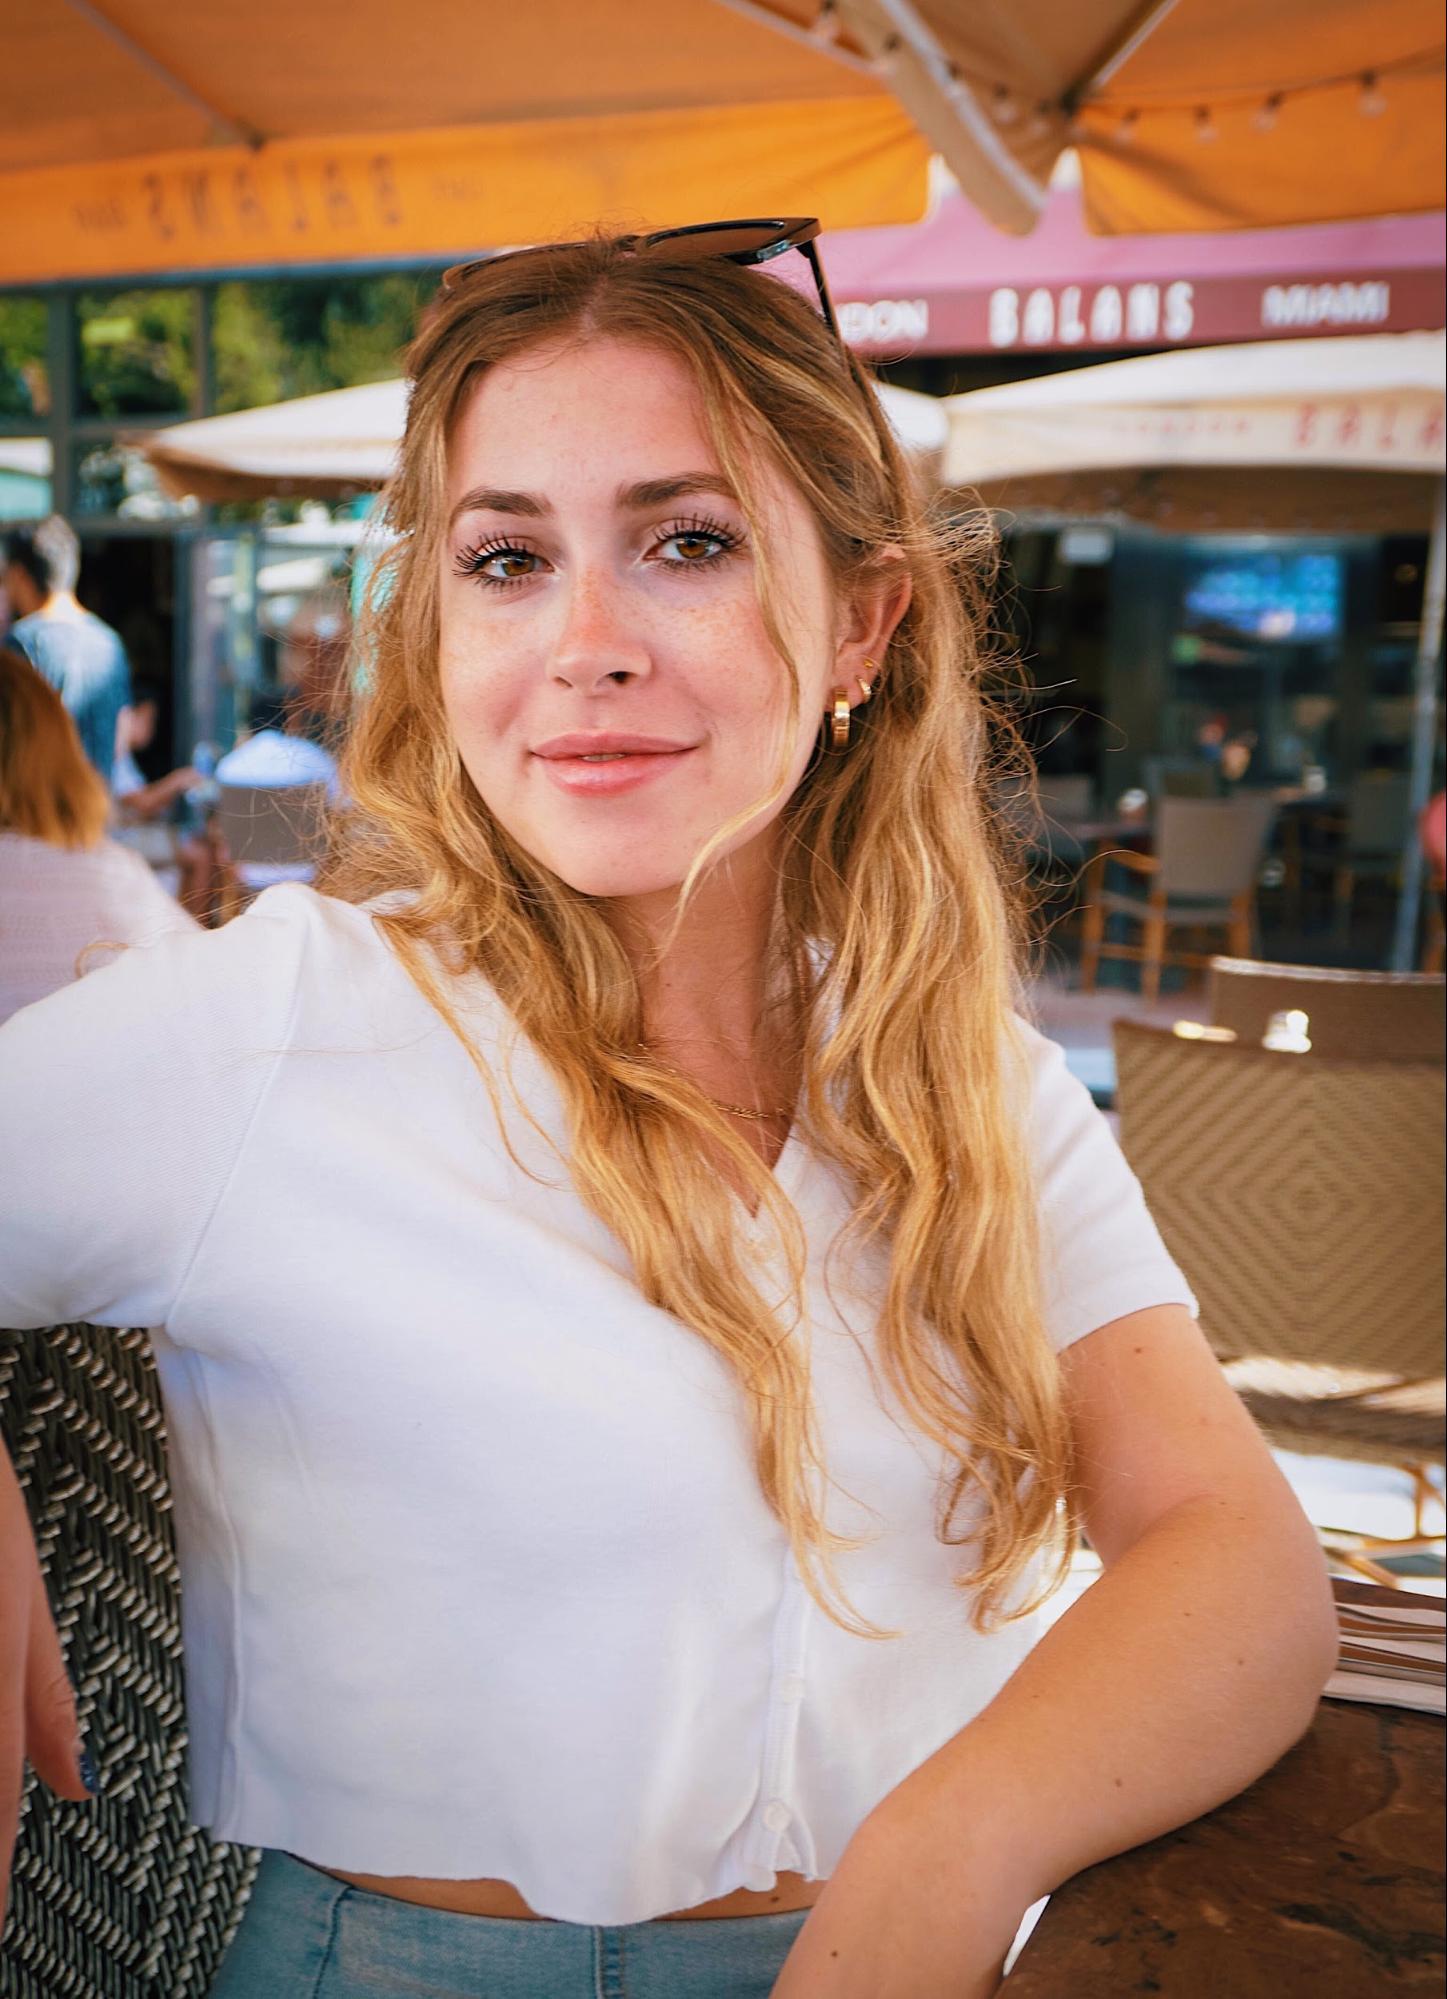 Alison Zhitko